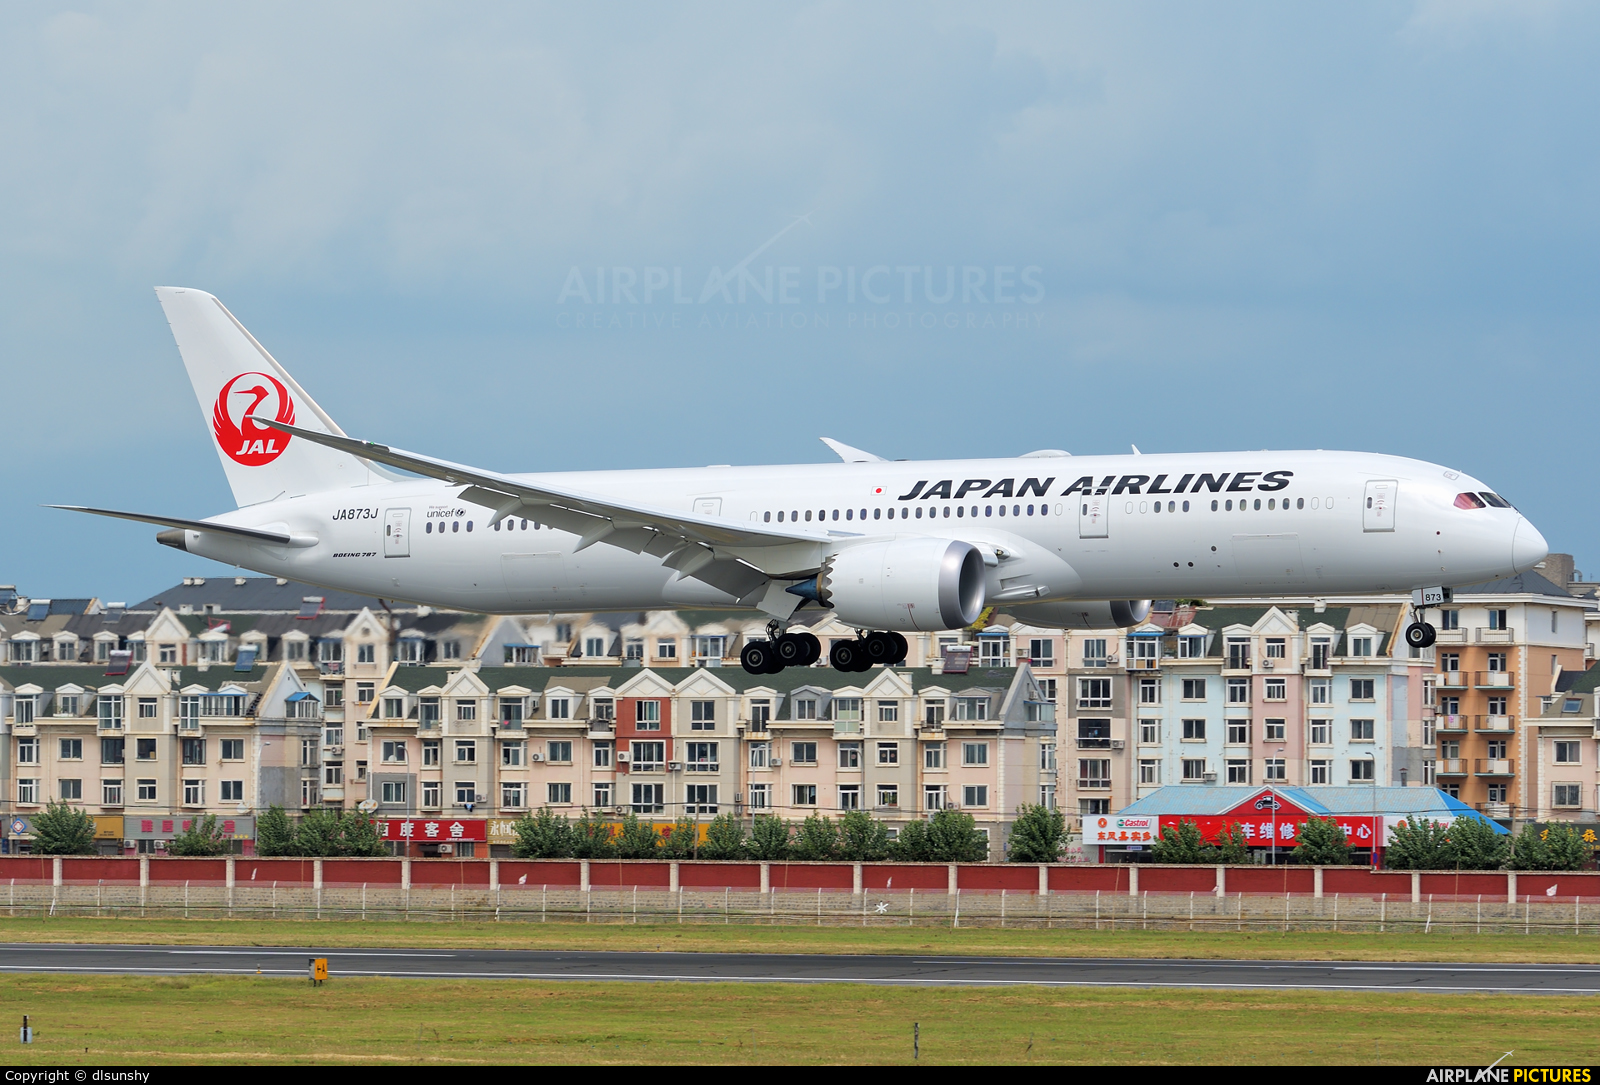 JAL - Japan Airlines JA873J aircraft at Dalian Zhoushuizi Int'l